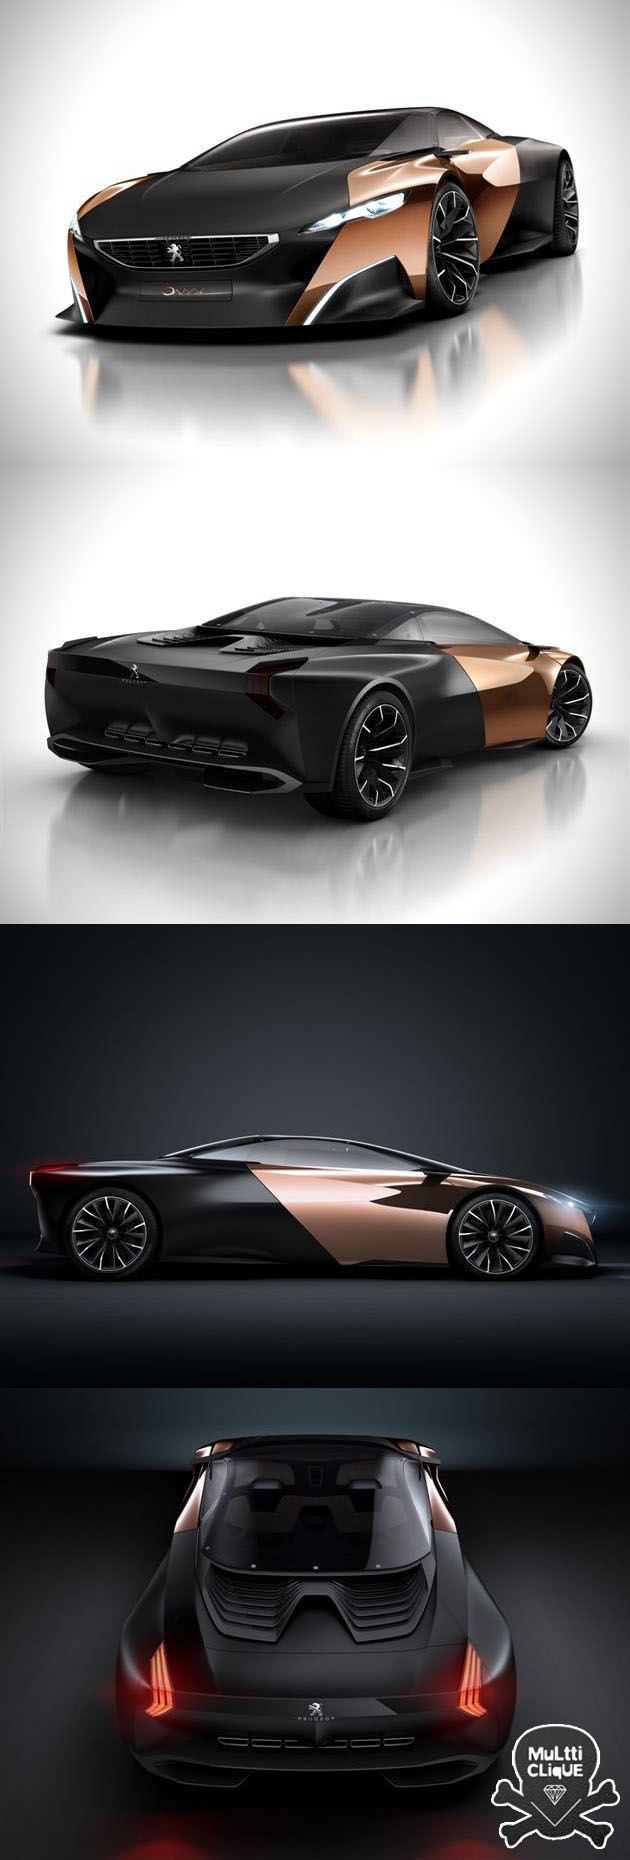 Industrial design: concept car sketching/rendering, Peugeot Onyx